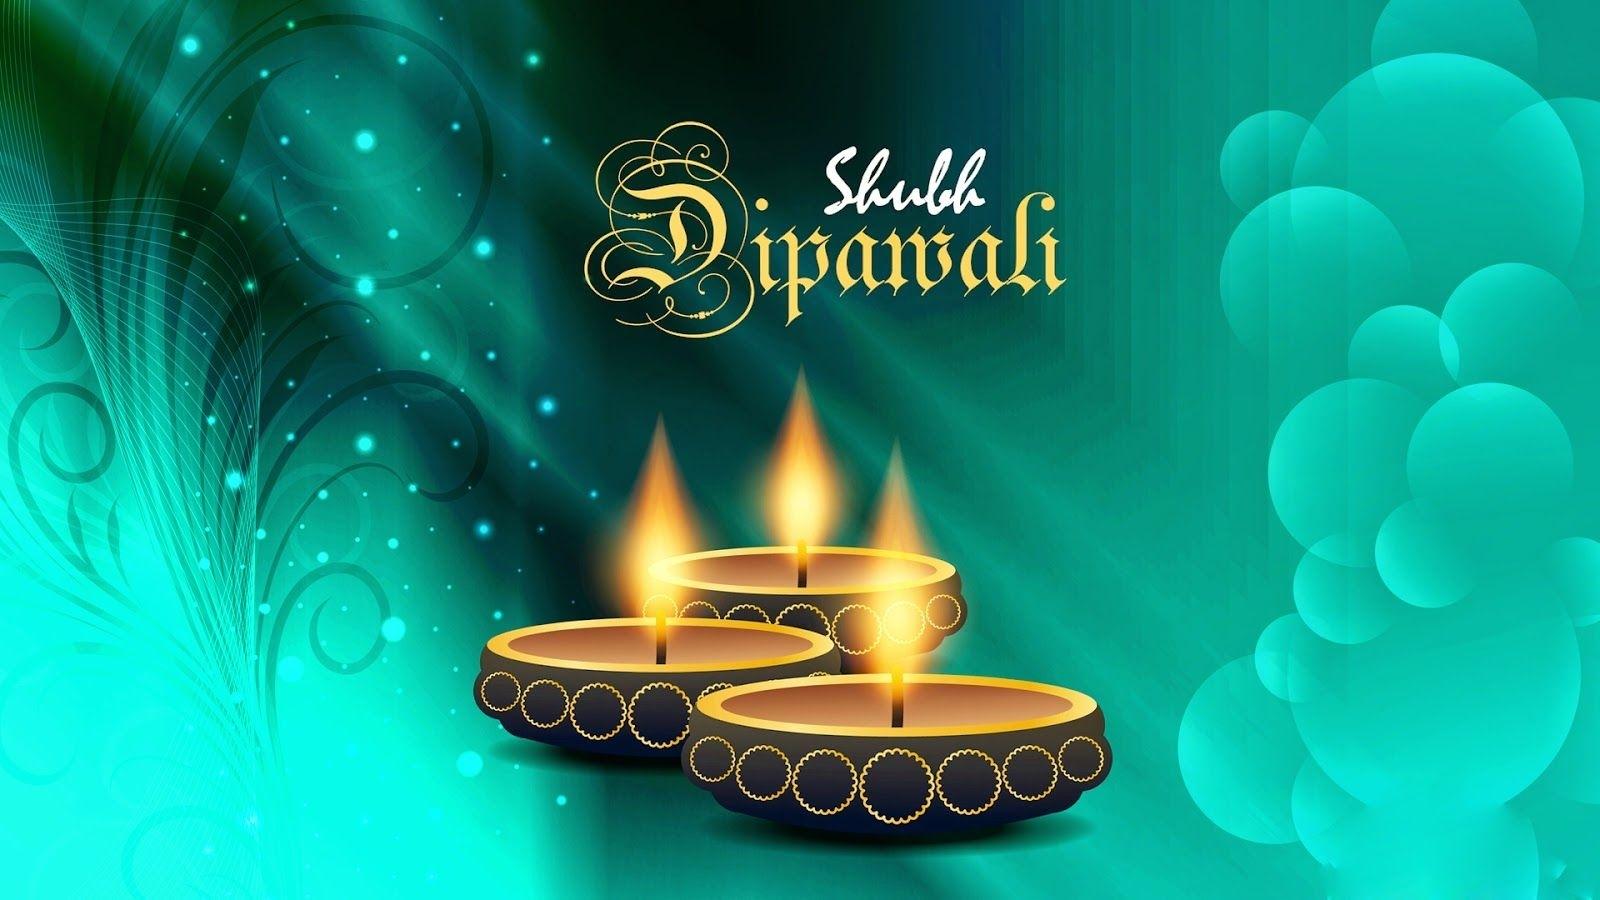 diwali wallpaper 2016: download free latest hd diwali wallpapers